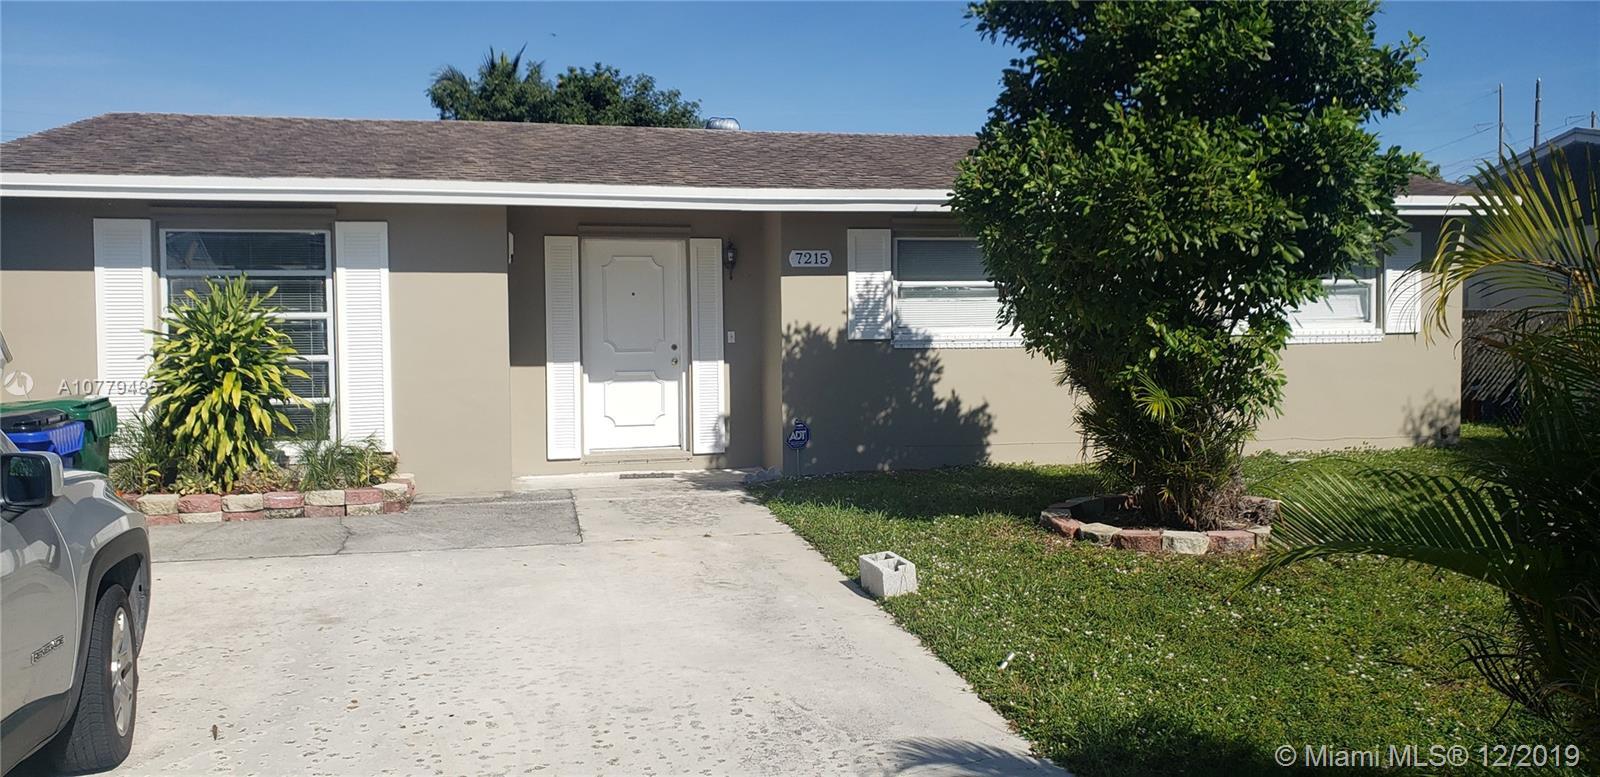 7215 Southgate Blvd, Margate, FL 33068